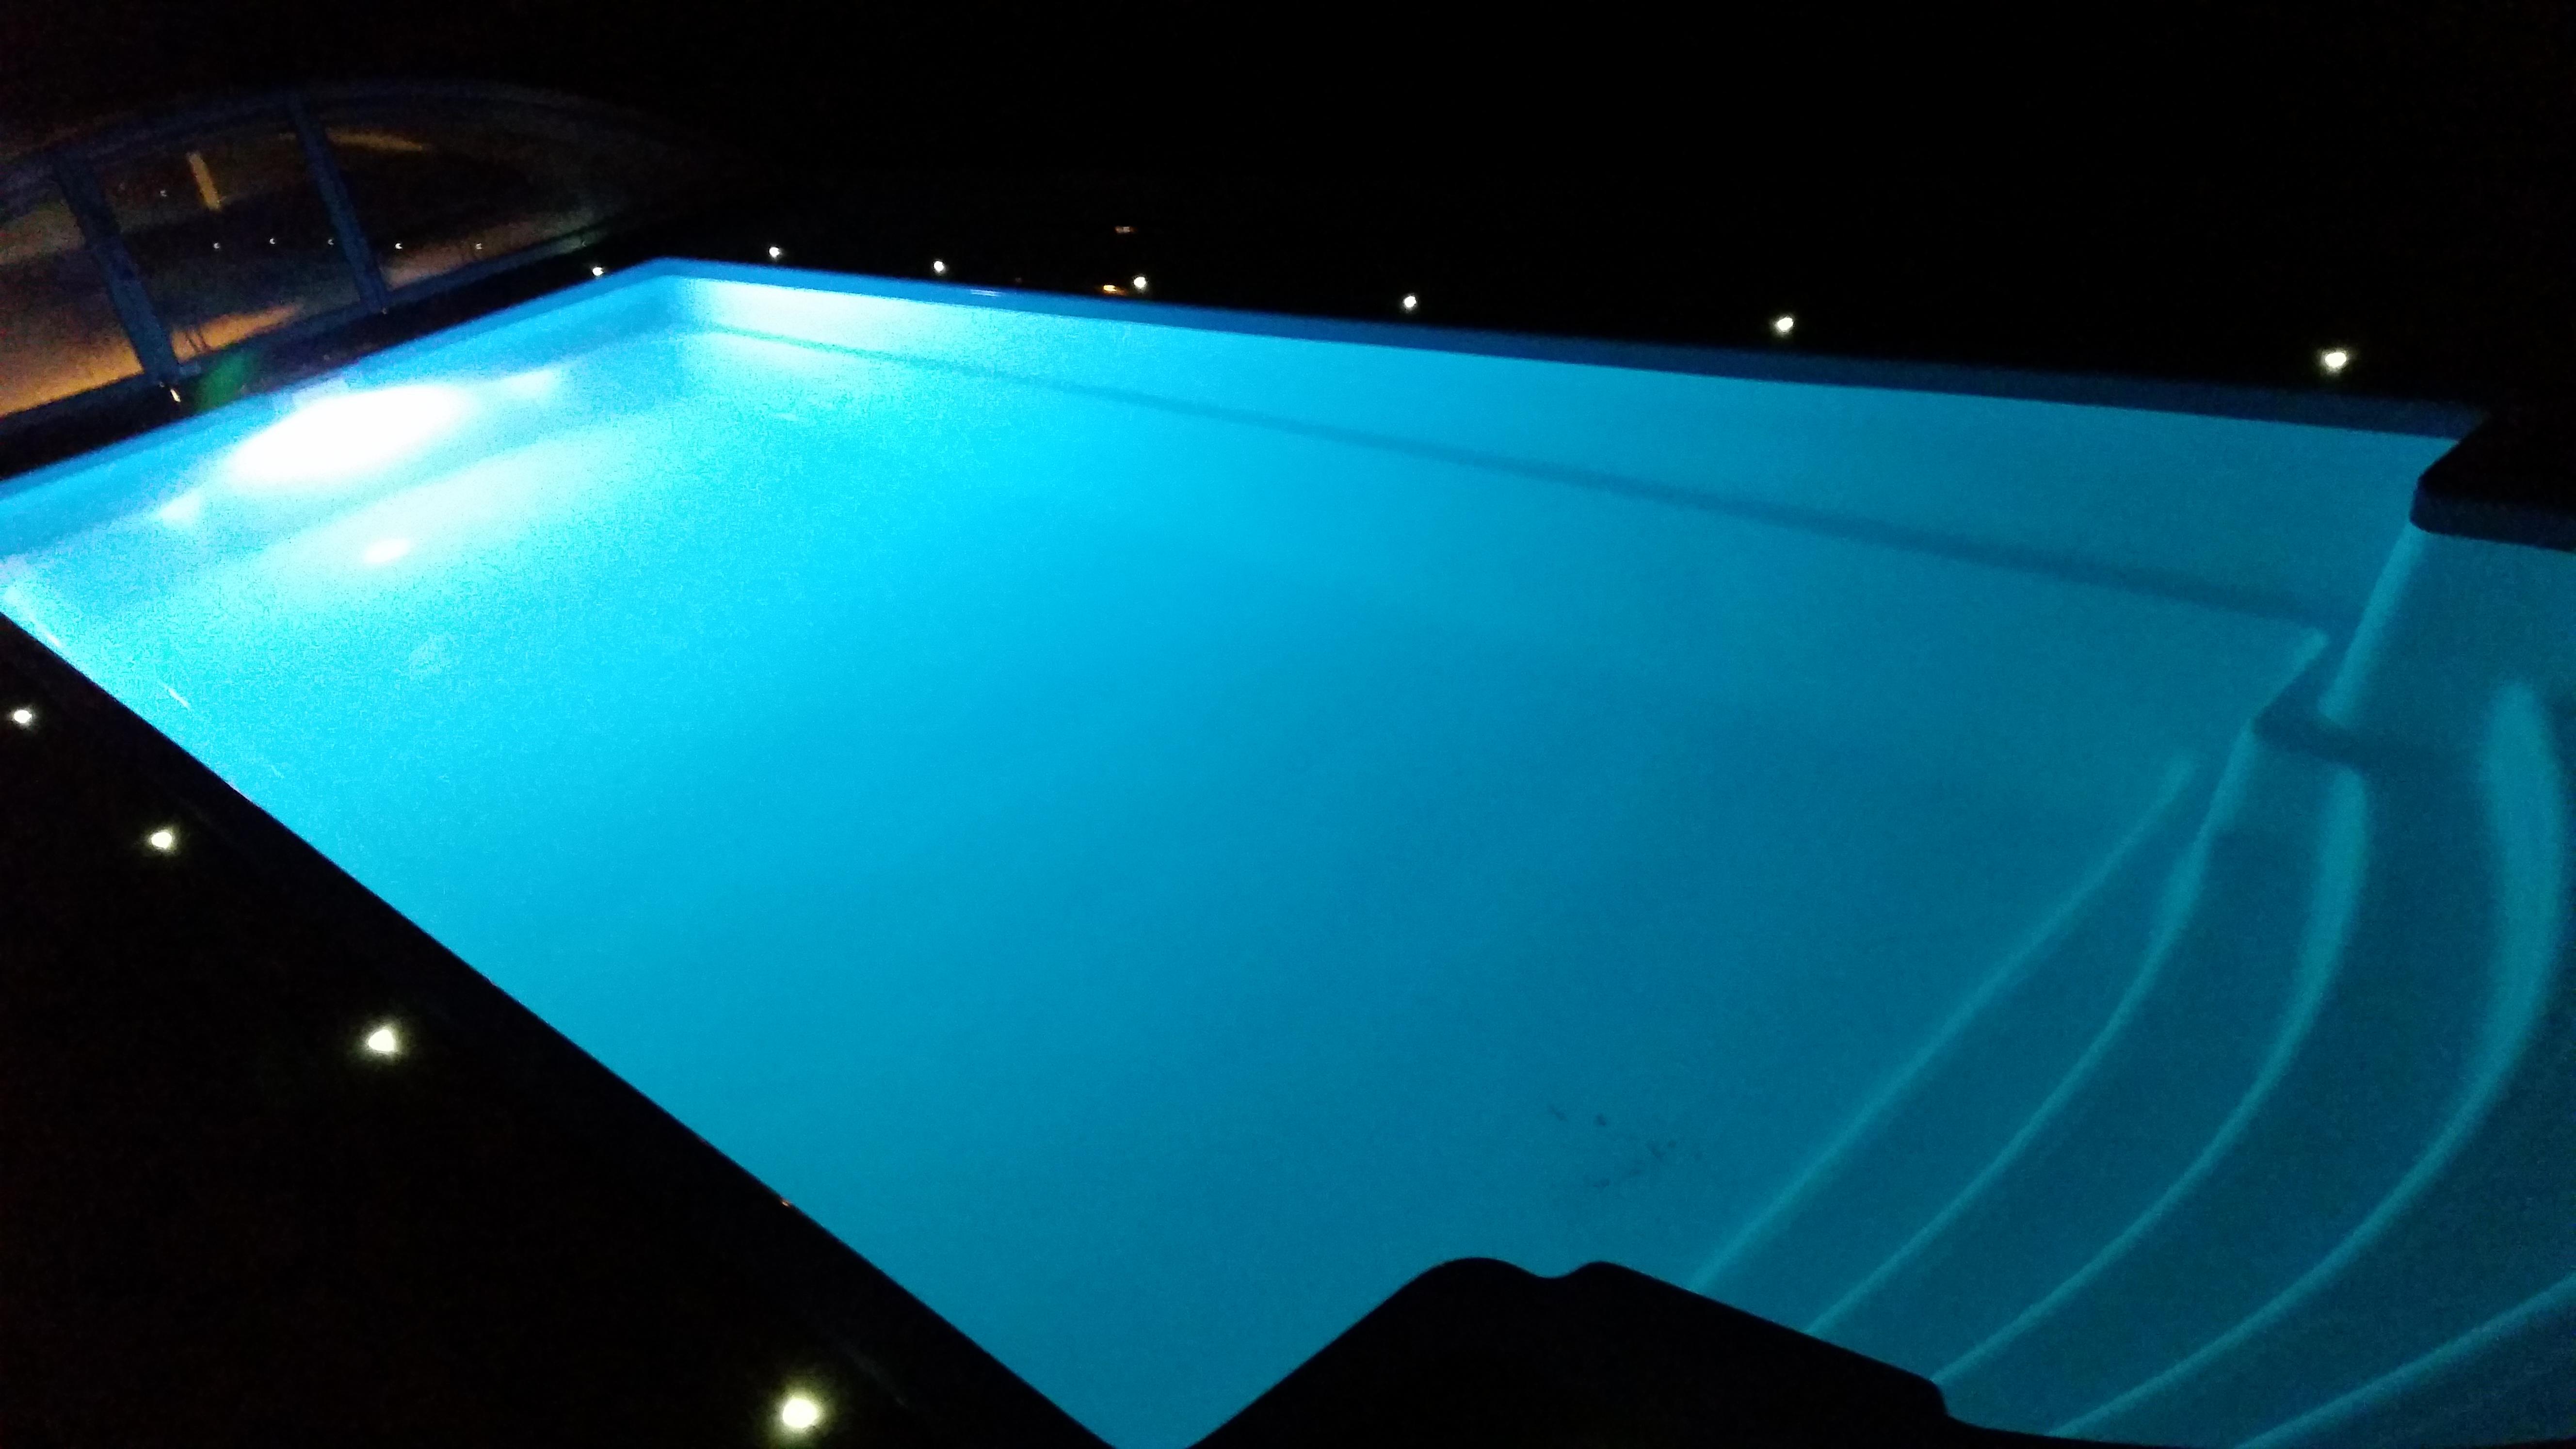 Hydro glassfiberbasseng blått lys